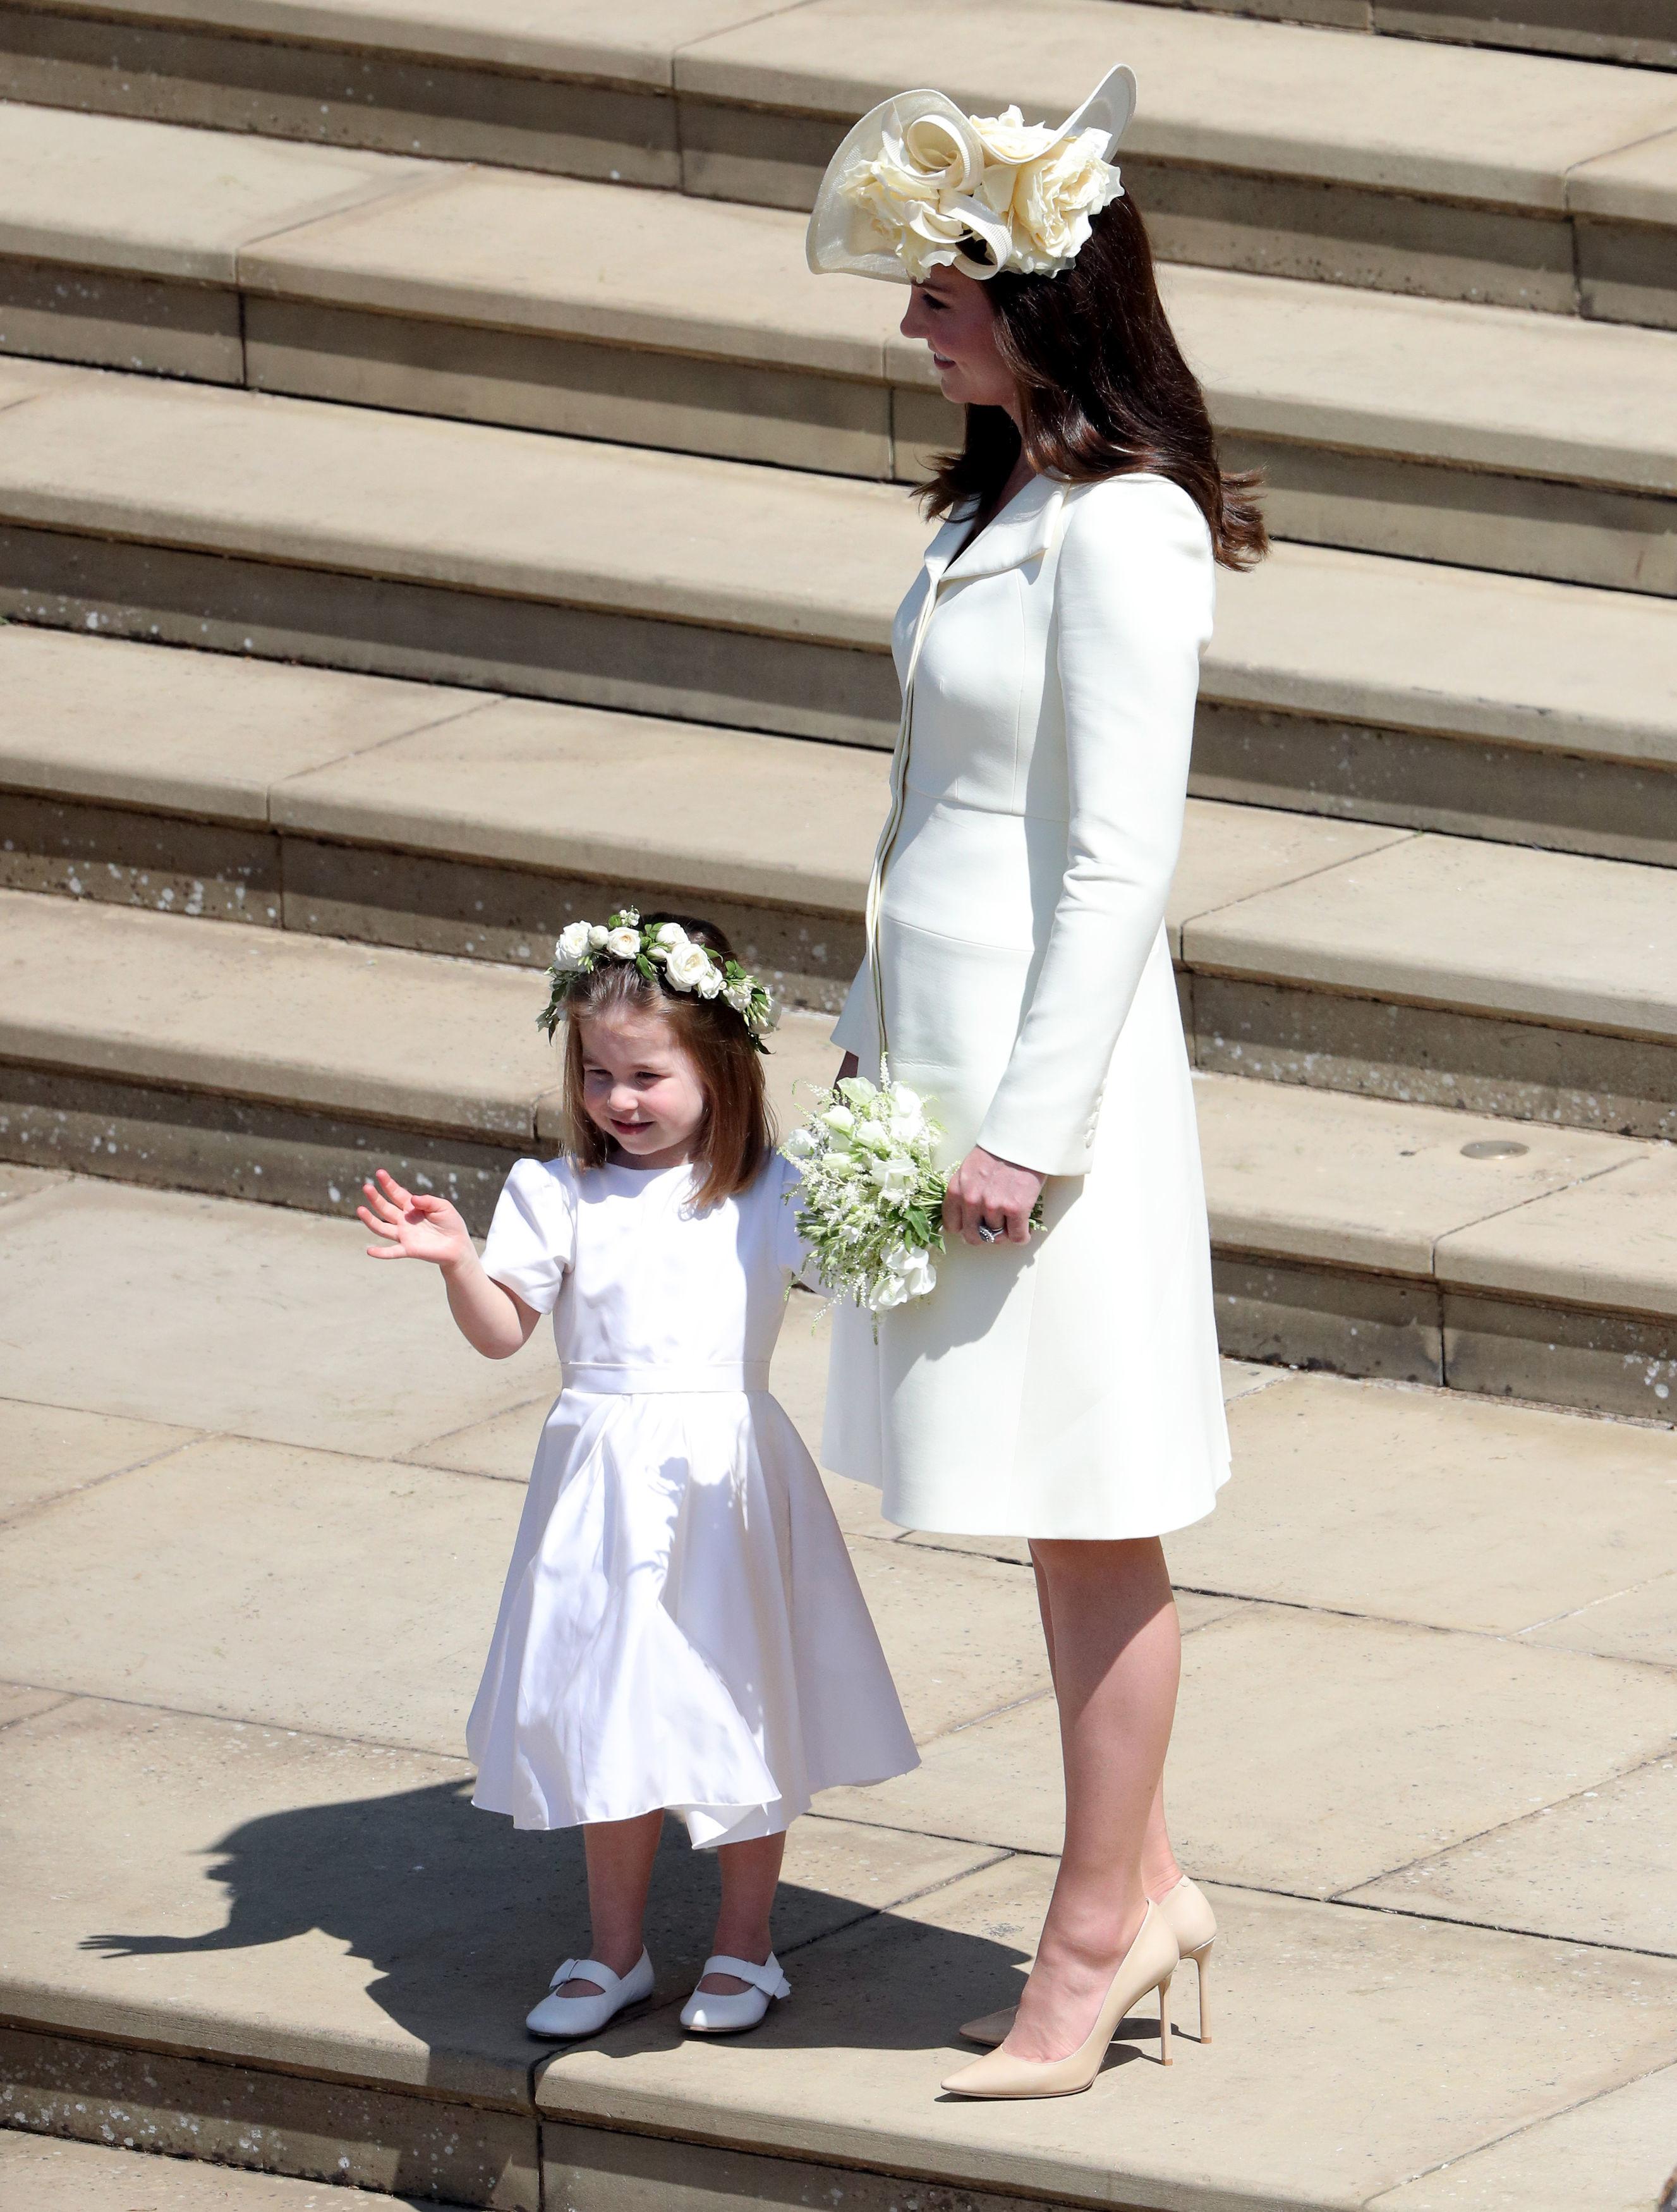 prince-harry-marries-ms-meghan-markle-windsor-castle-18